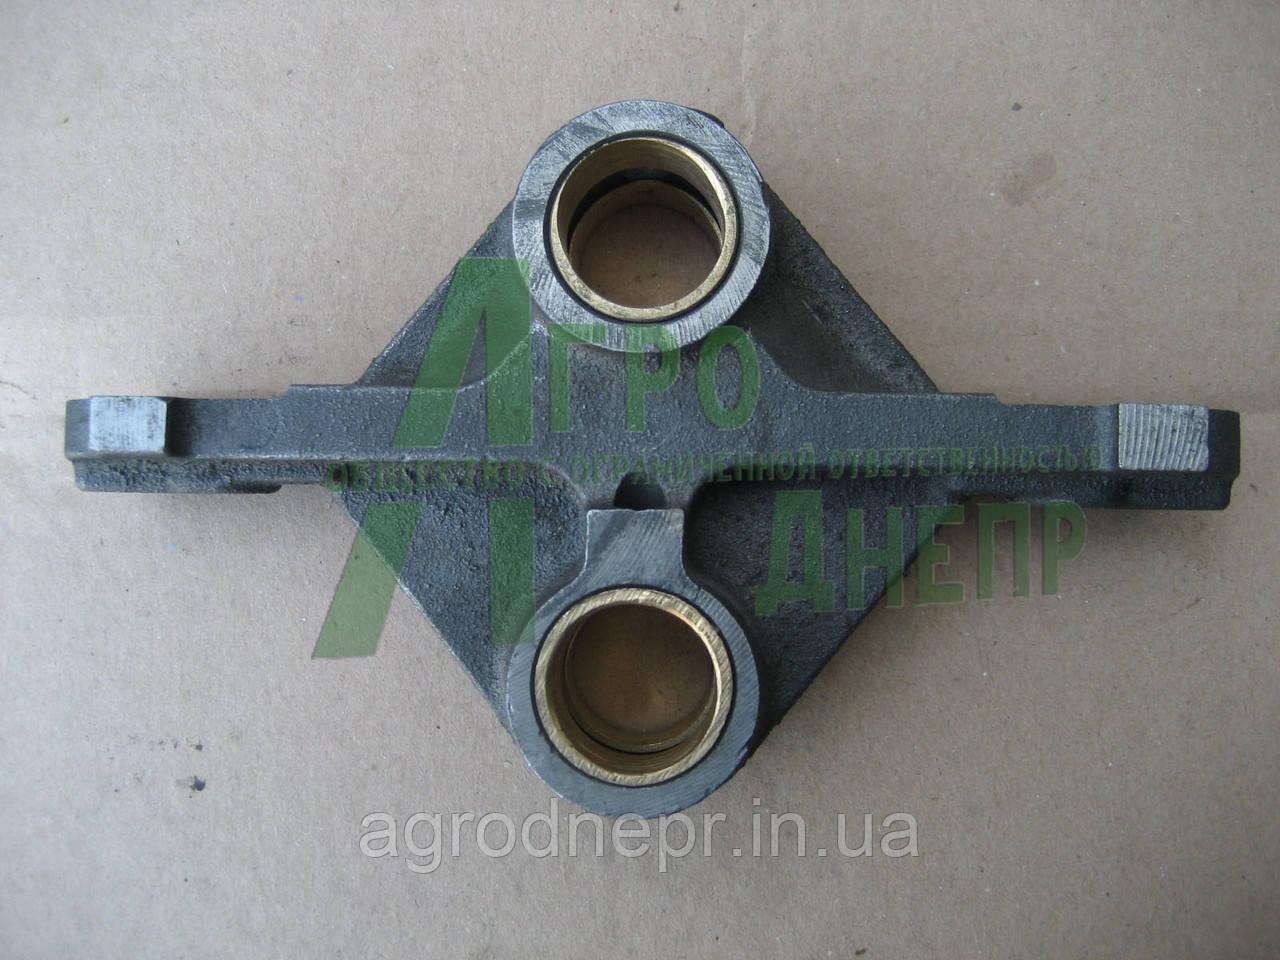 Кронштейн привода масляного насоса Д-65 Д08-С05-А СБ